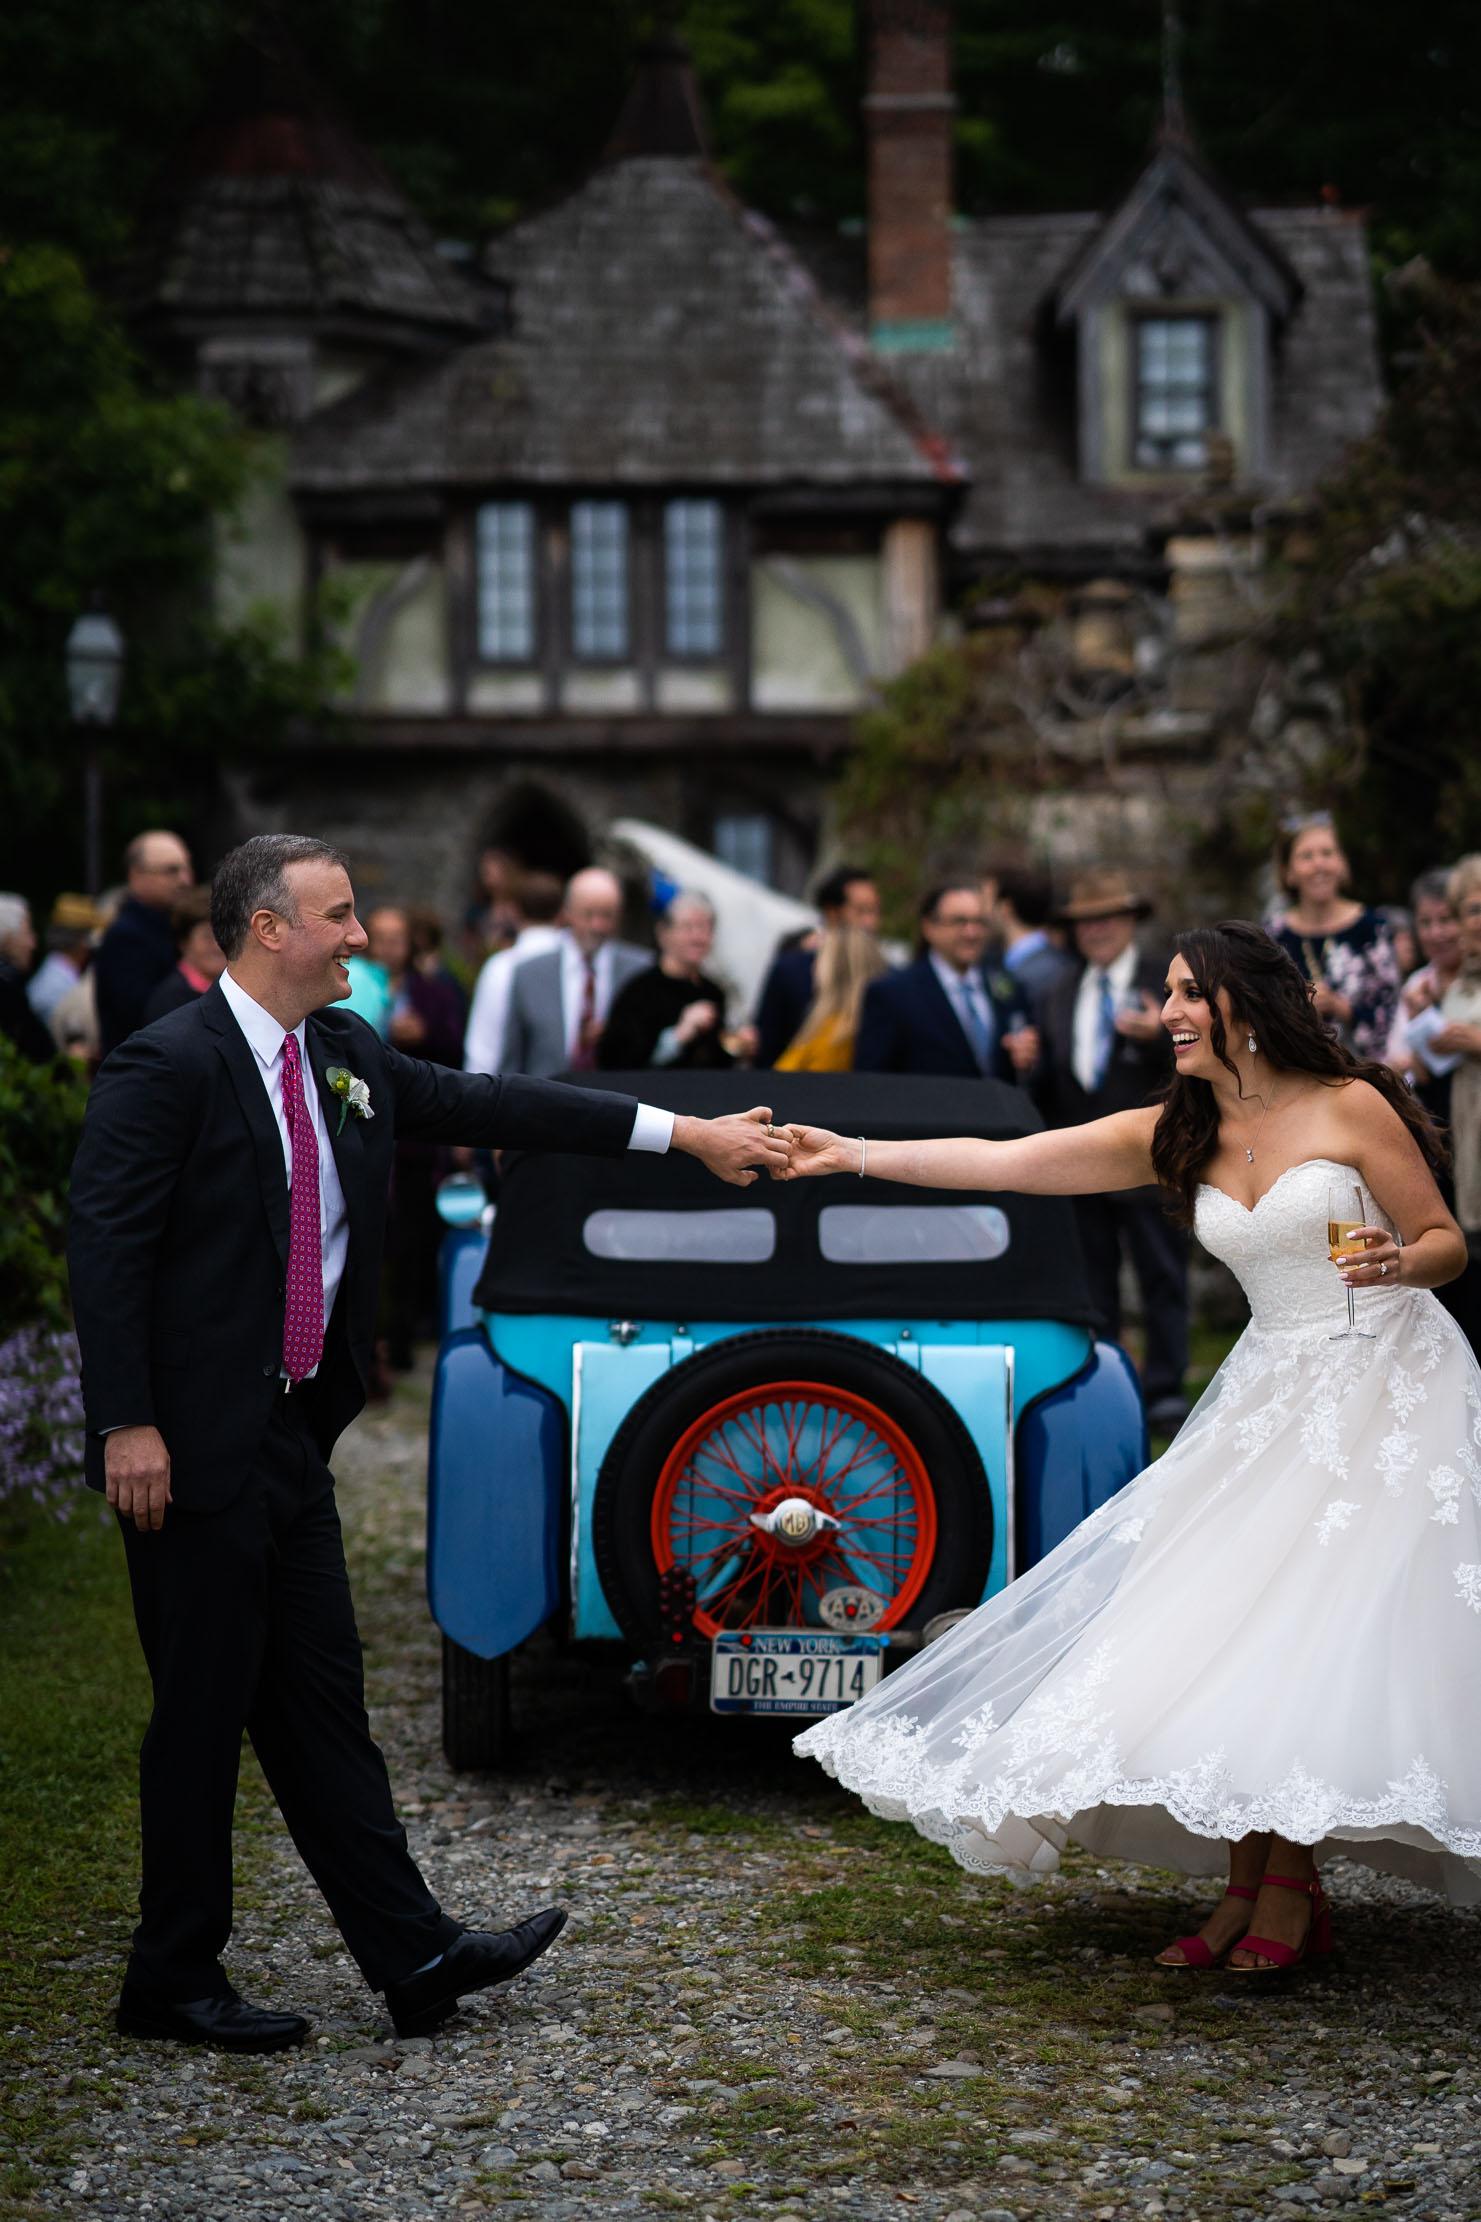 Wings-Castle-Millbrook-NY-Upstate-Wedding-Photographer-1108.jpg